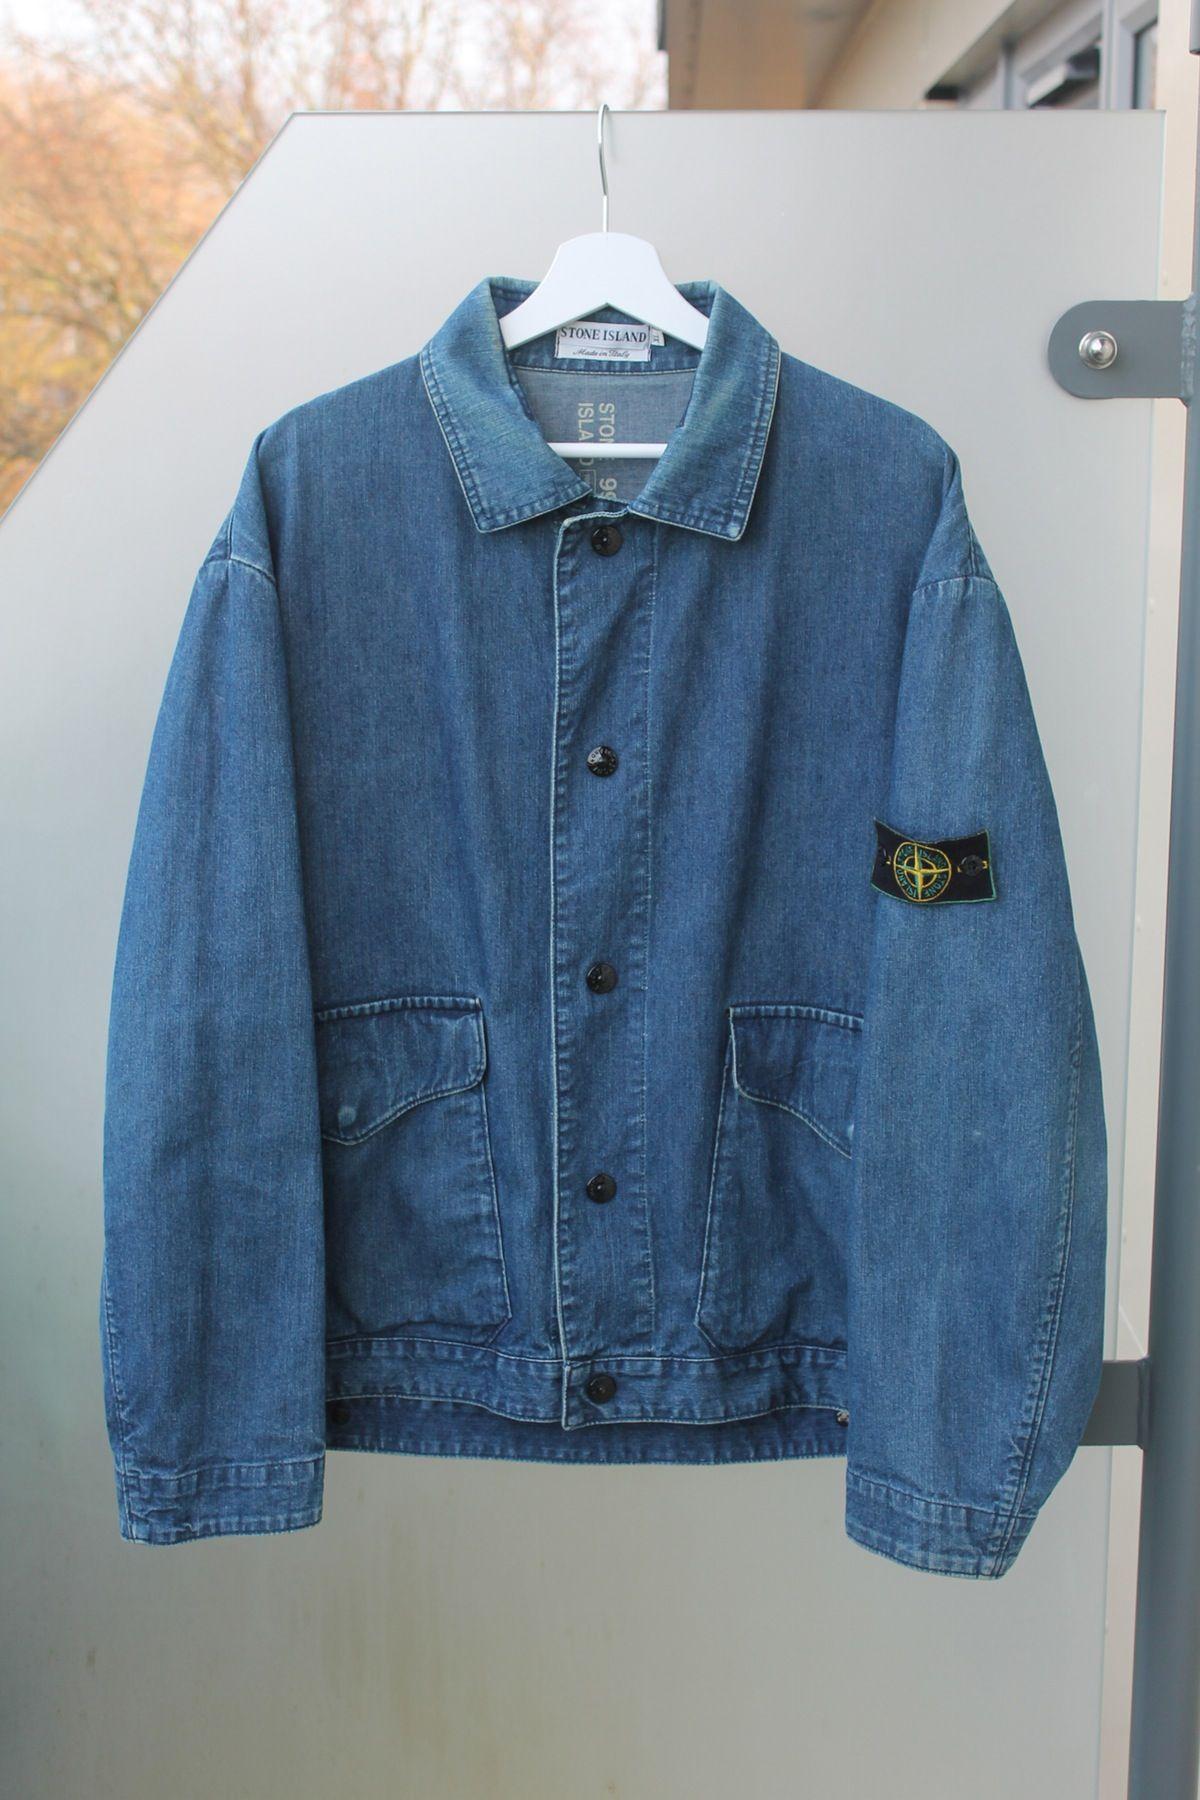 Image Of S S 1995 Stone Island Denim Jacket Casual Outerwear Menswear Stone Island Shorts